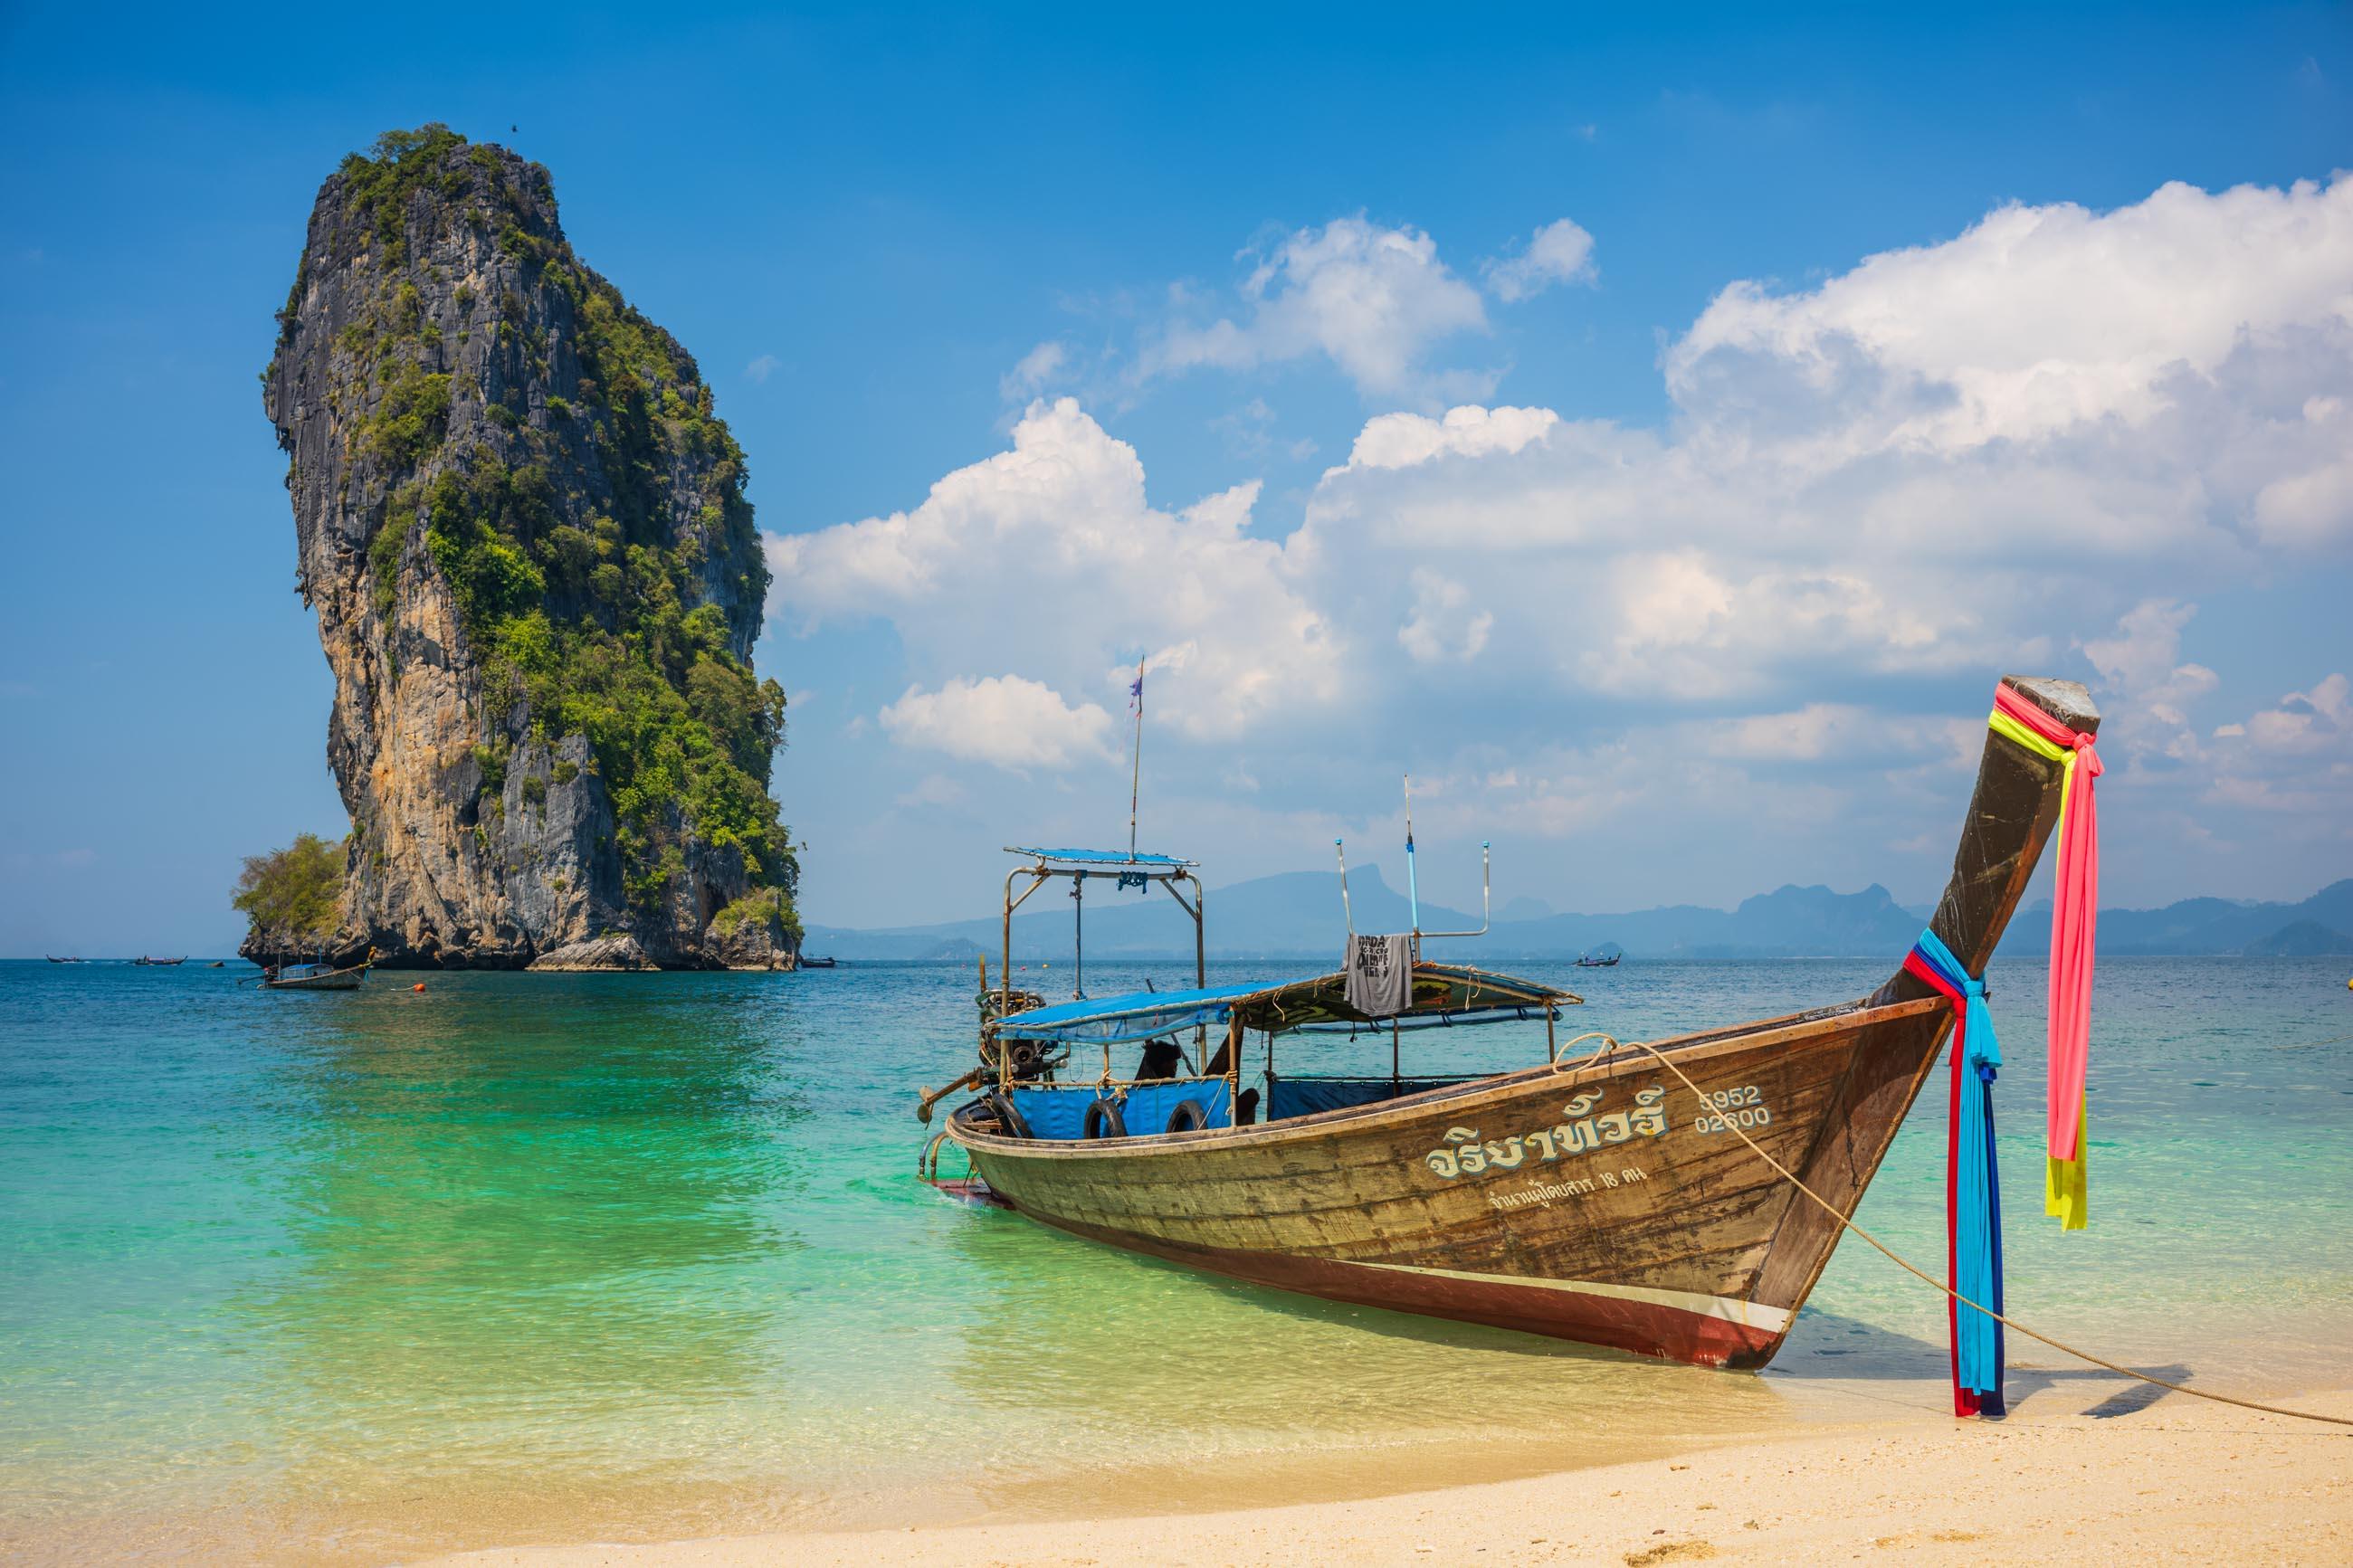 https://bubo.sk/uploads/galleries/7534/7twxo__robotaraba_thajsko_krabi_plaze-2-.jpg